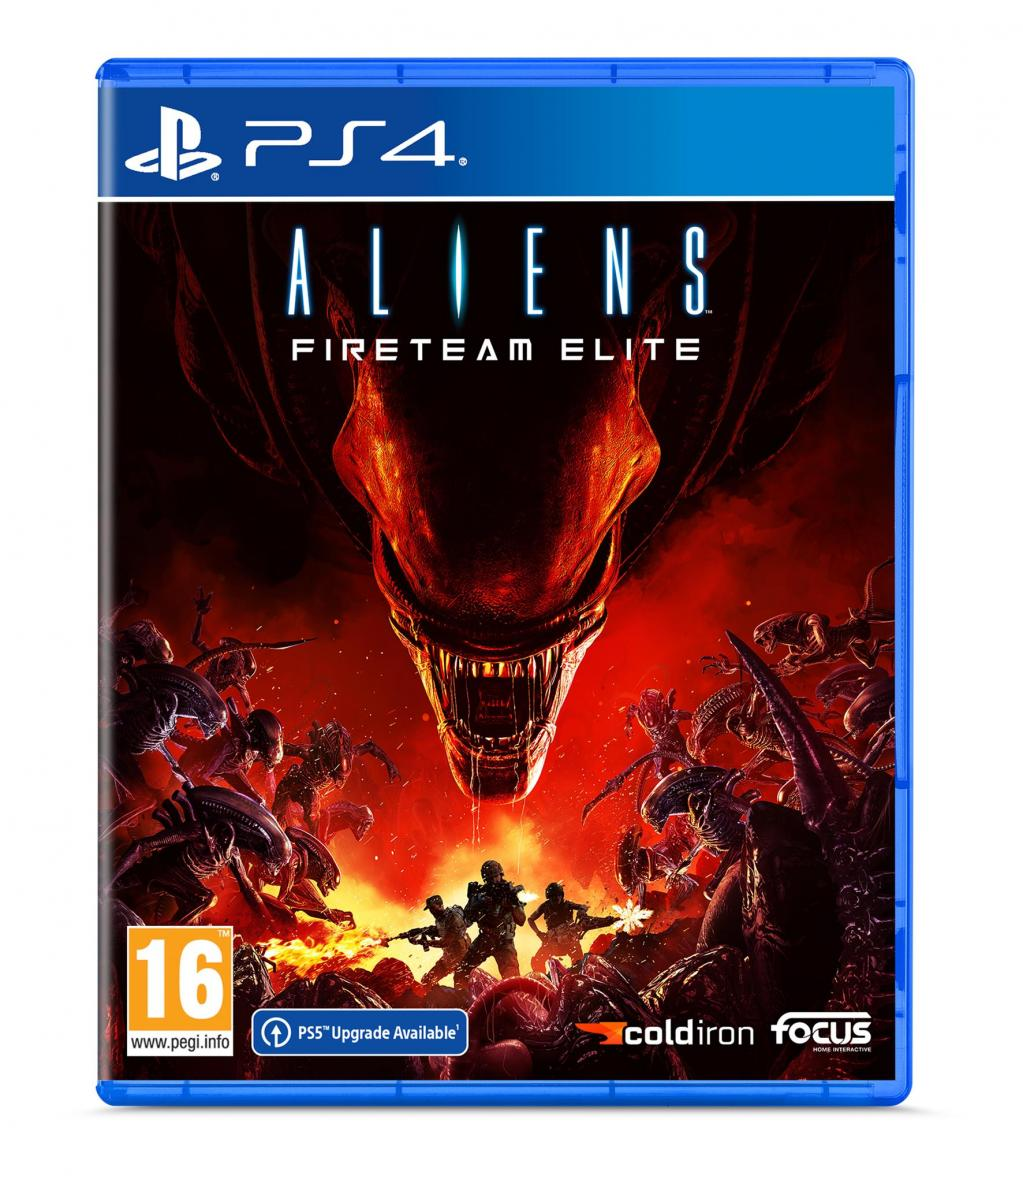 Aliens: Fireteam Elite - Upgrade PS5_1